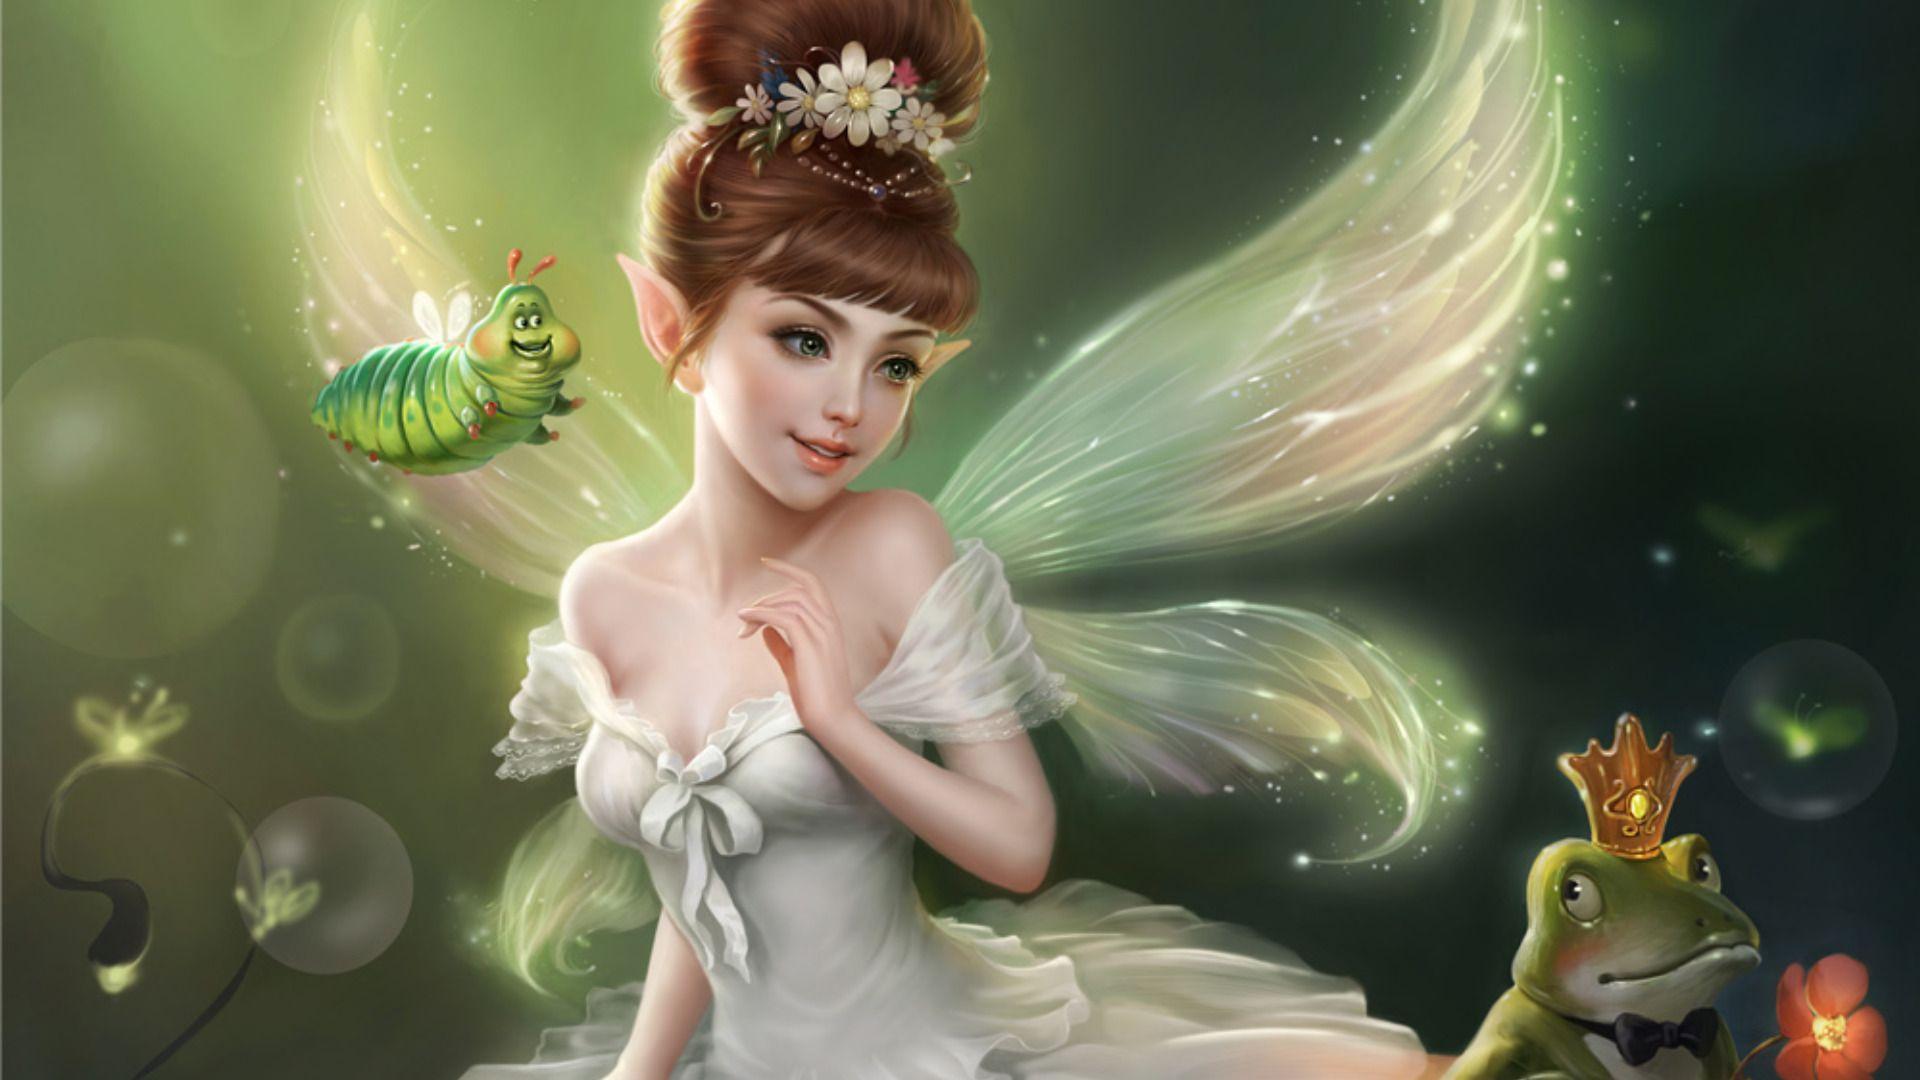 water fairy wallpaper beautiful - photo #22